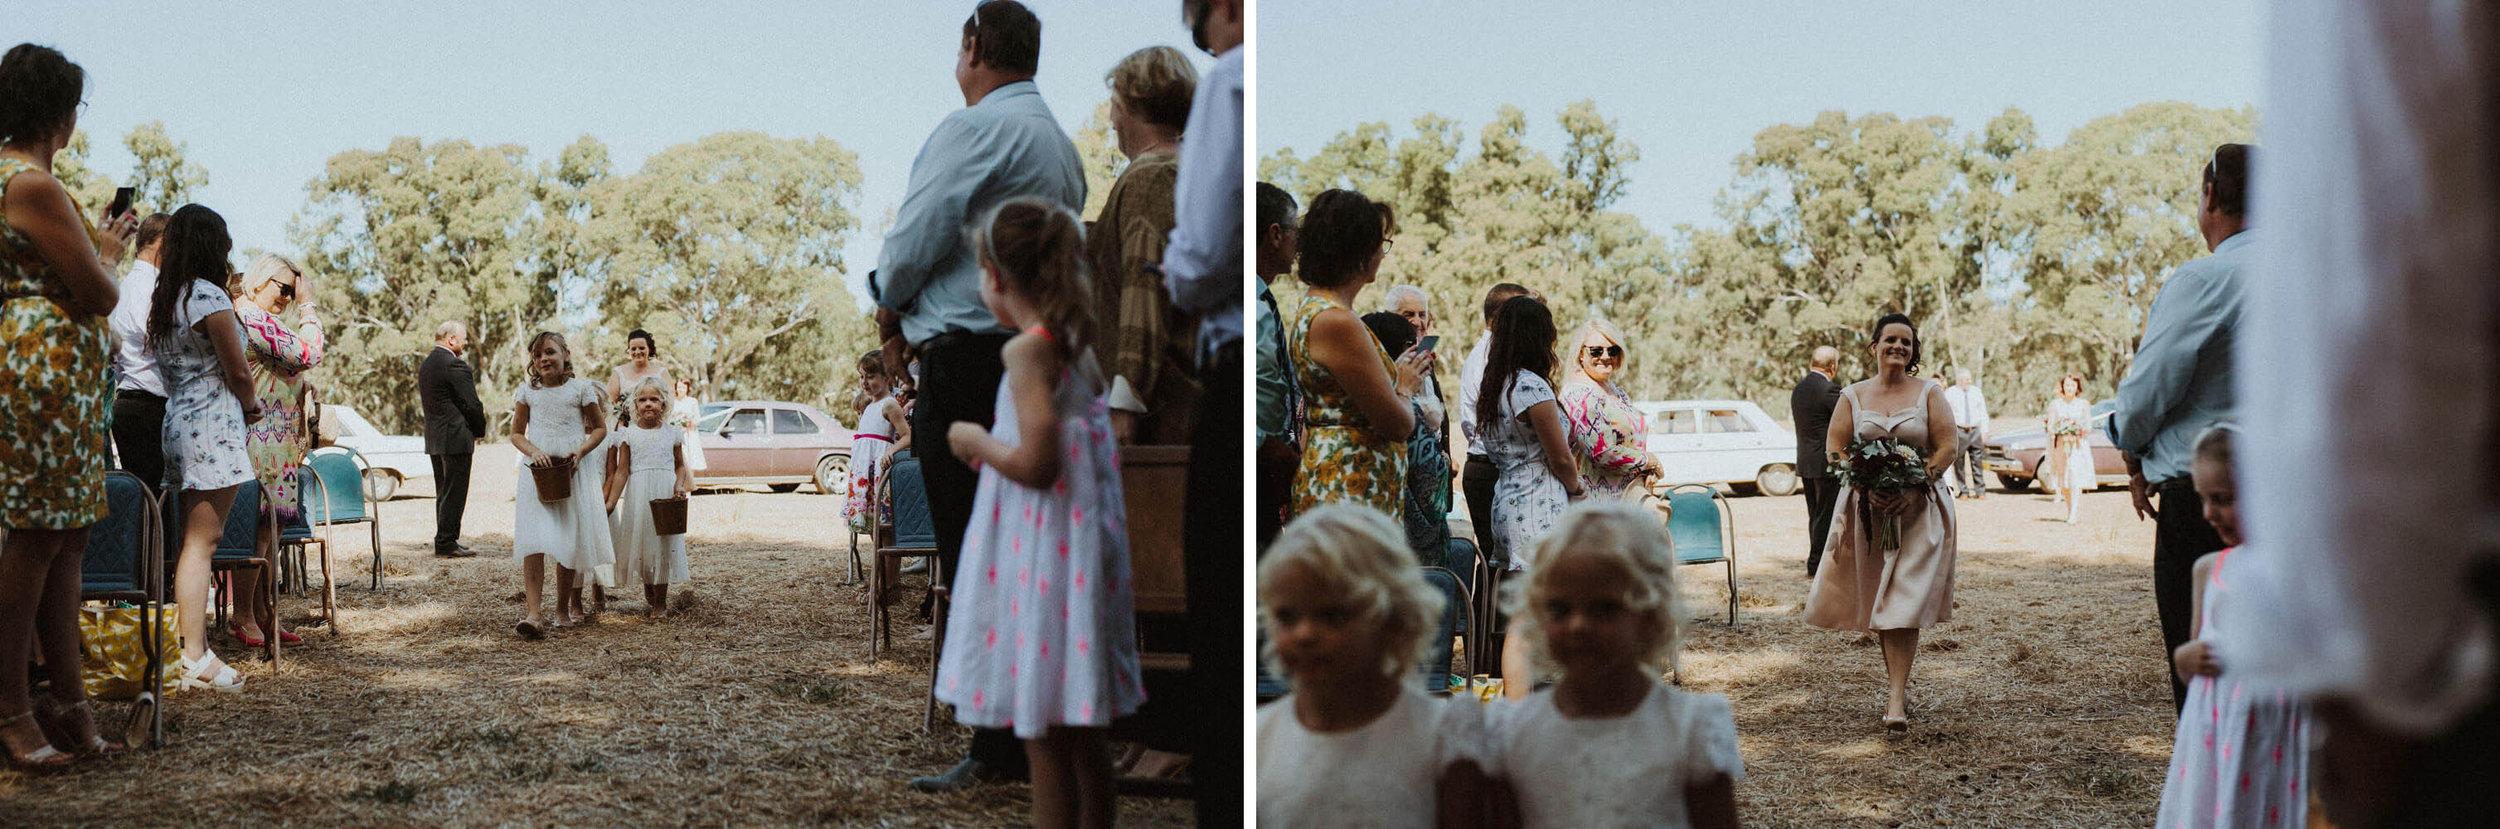 australian-wedding-photography_079(1394)2.jpg